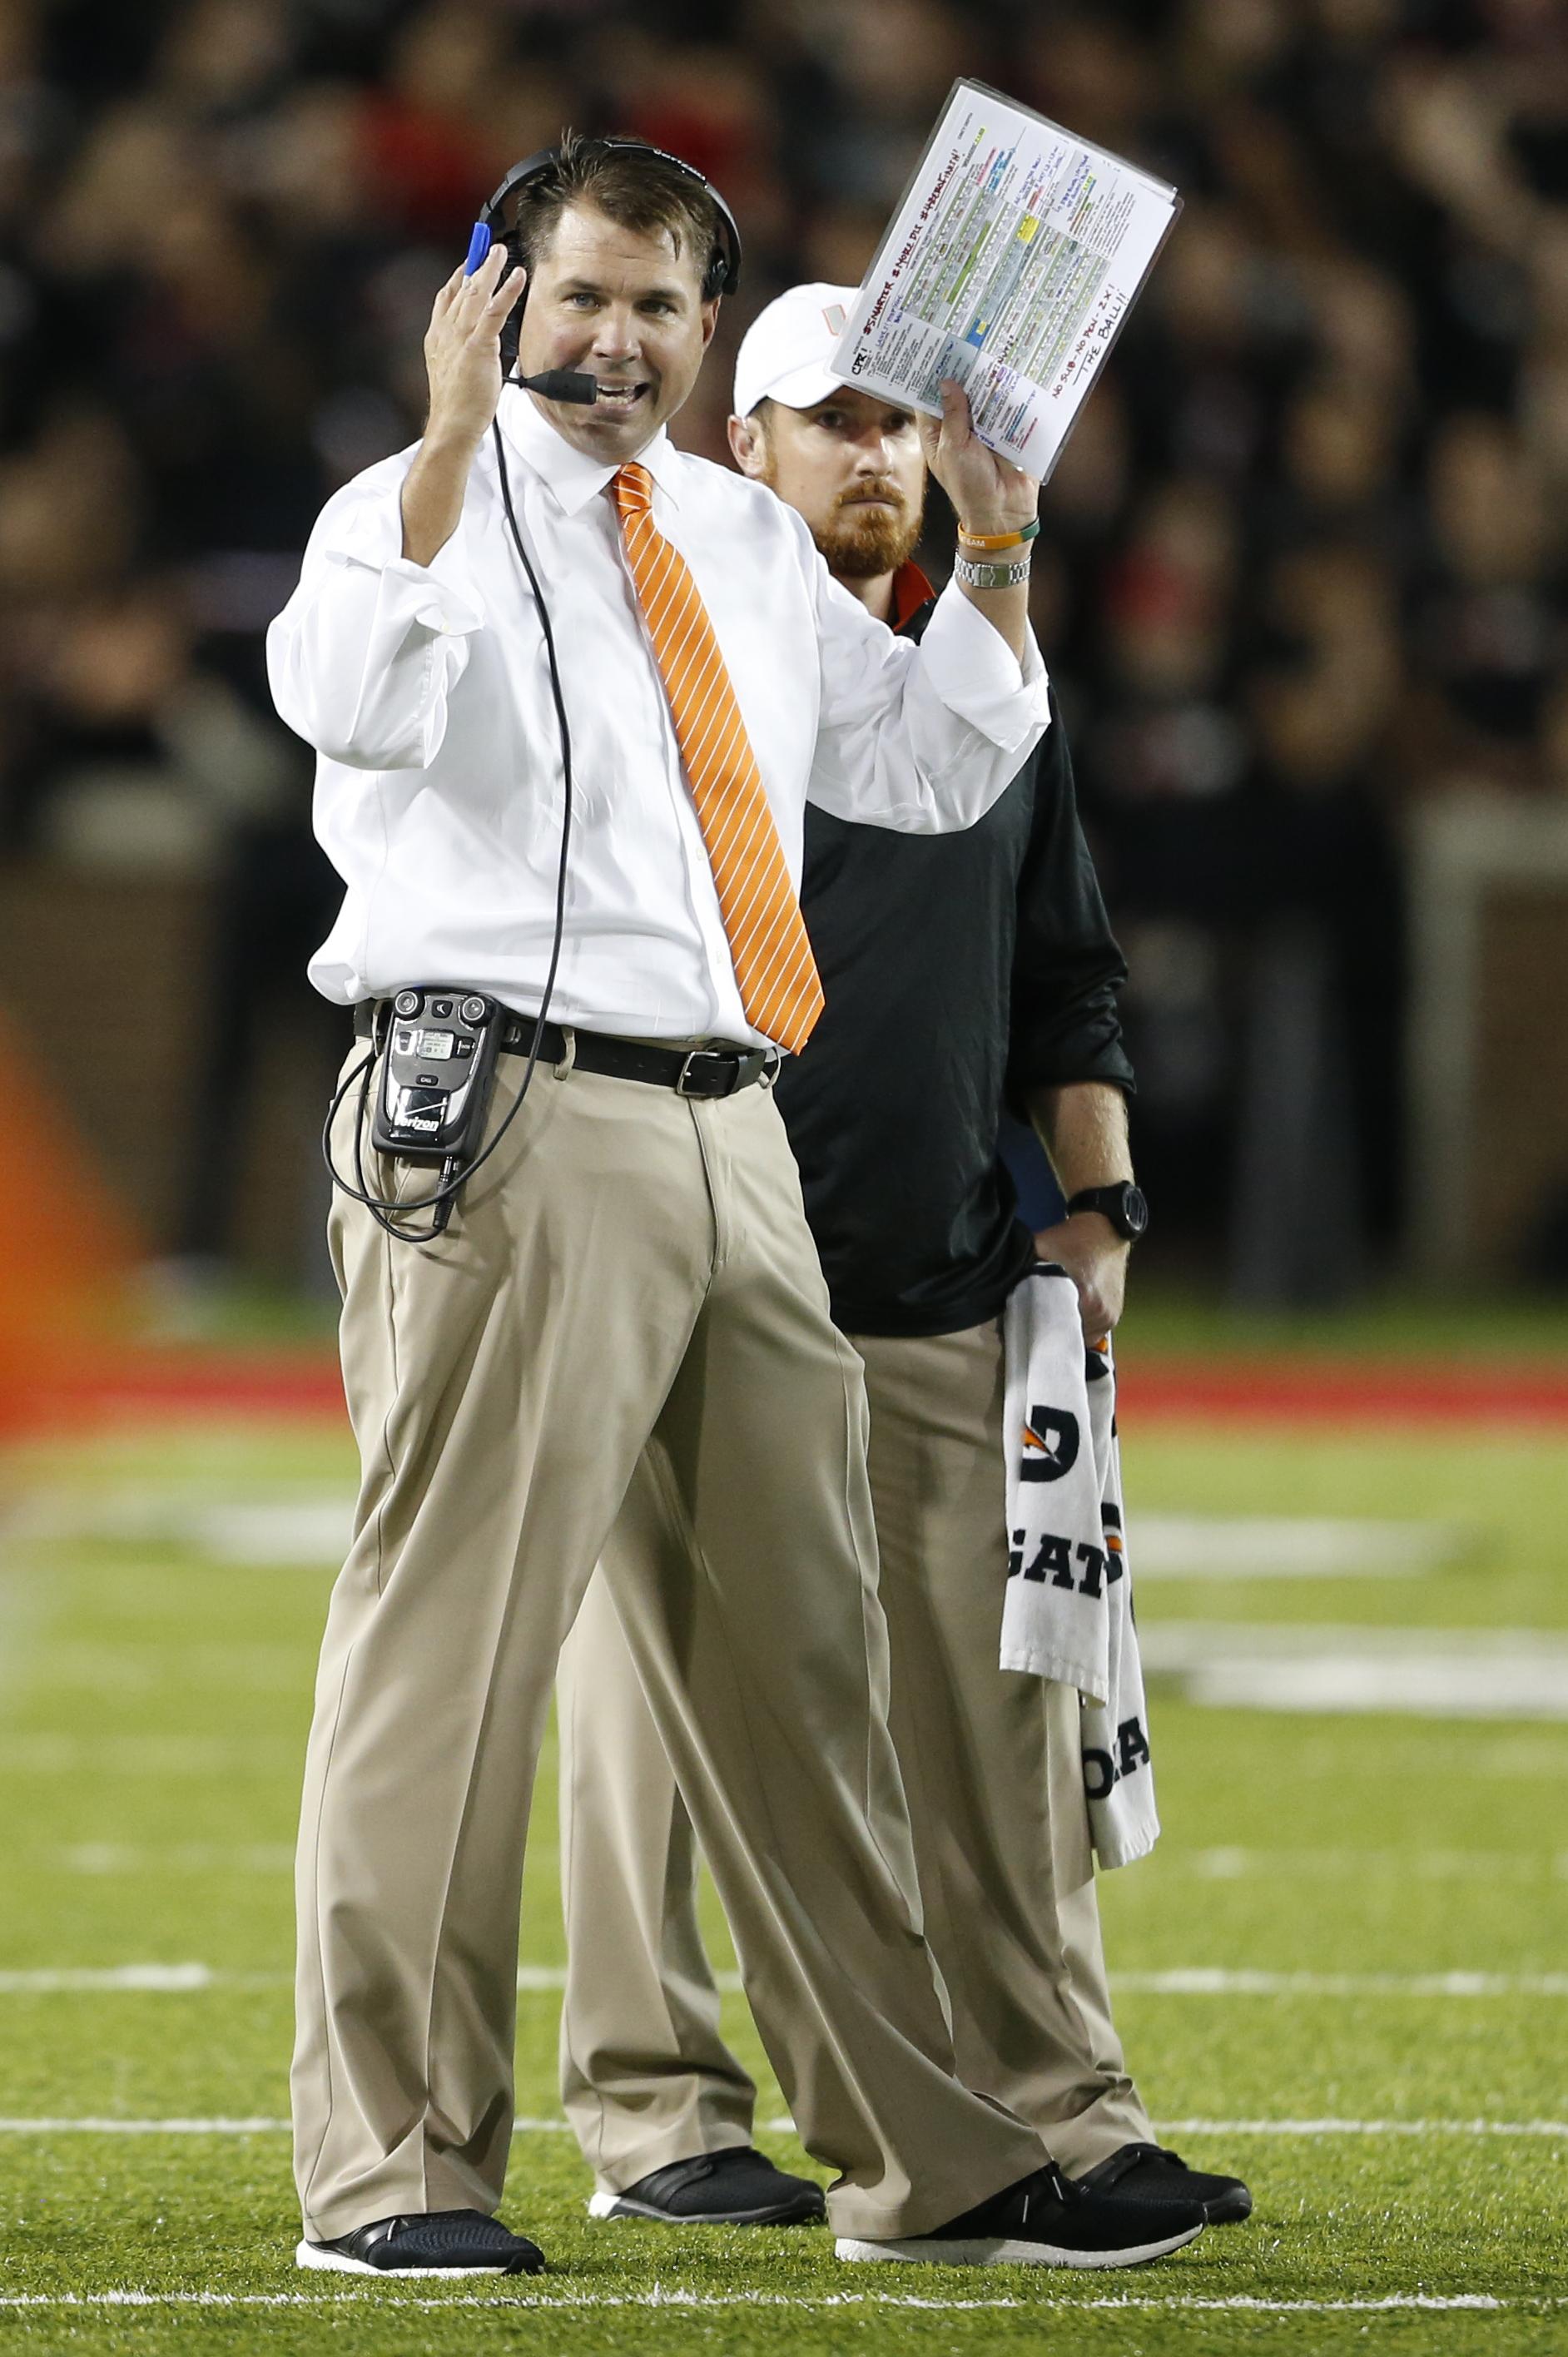 Miami head coach Al Golden gives instructions during the first half of an NCAA college football game against Cincinnati, Thursday, Oct. 1, 2015, in Cincinnati. (AP Photo/Gary Landers)